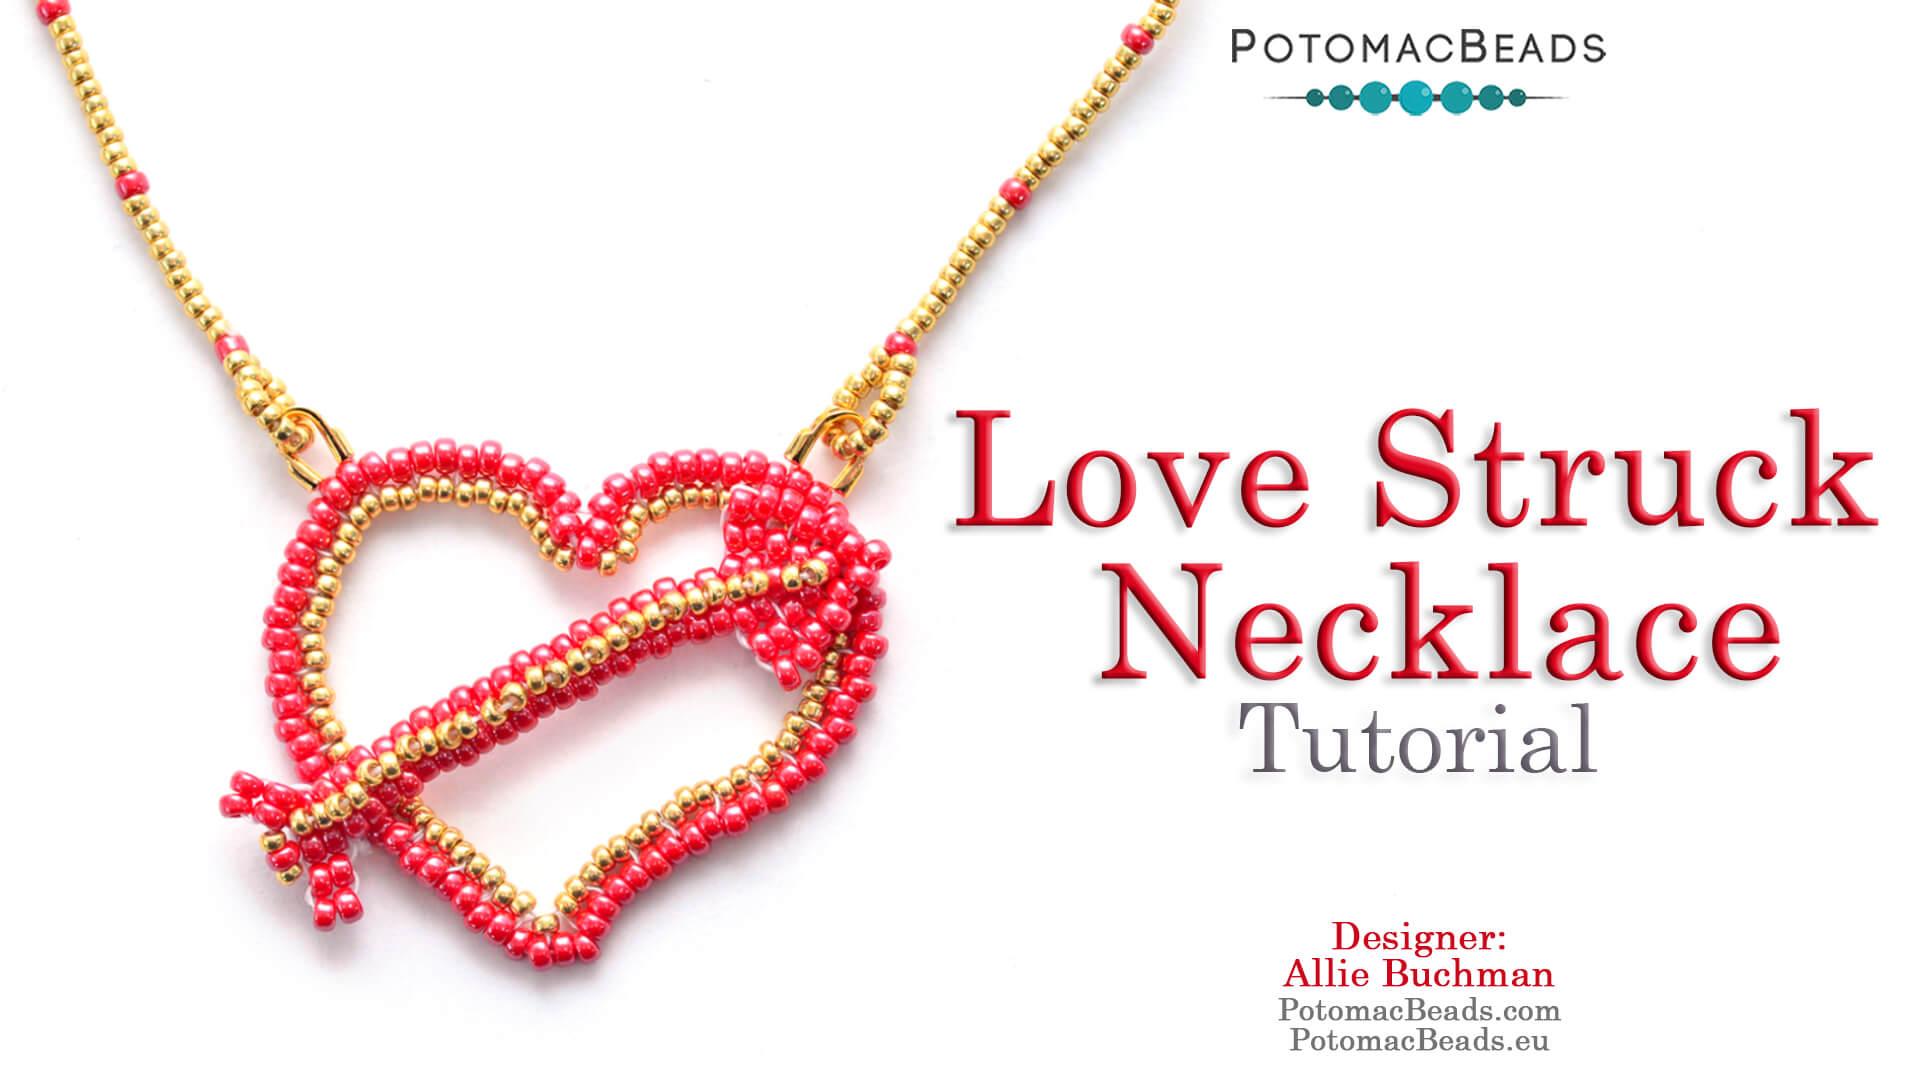 How to Bead Jewelry / Beading Tutorials & Jewel Making Videos / Bead Weaving Tutorials & Necklace Tutorial / Love Struck Necklace Tutorial